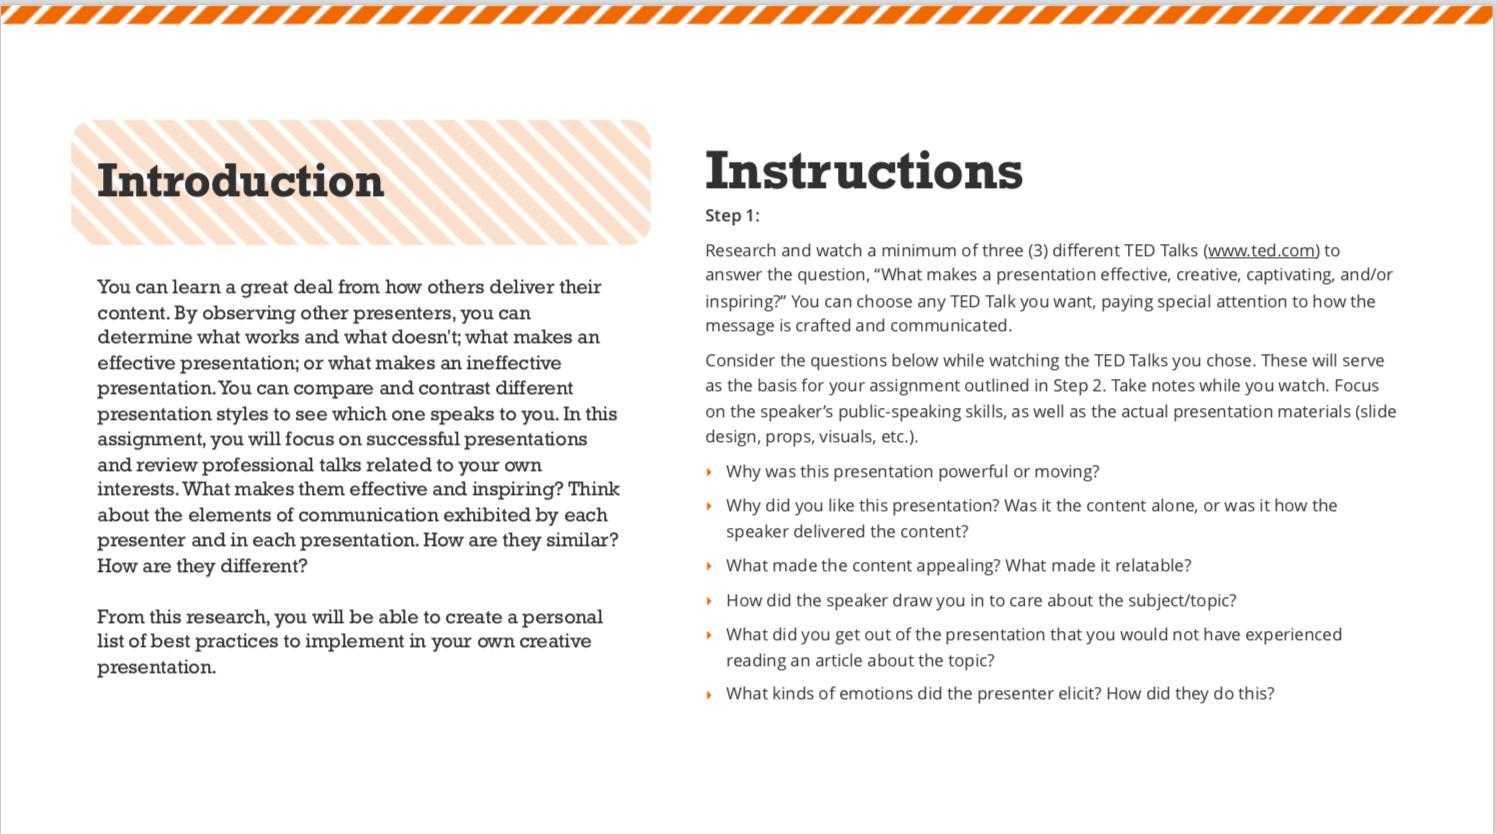 Instructions 2/3